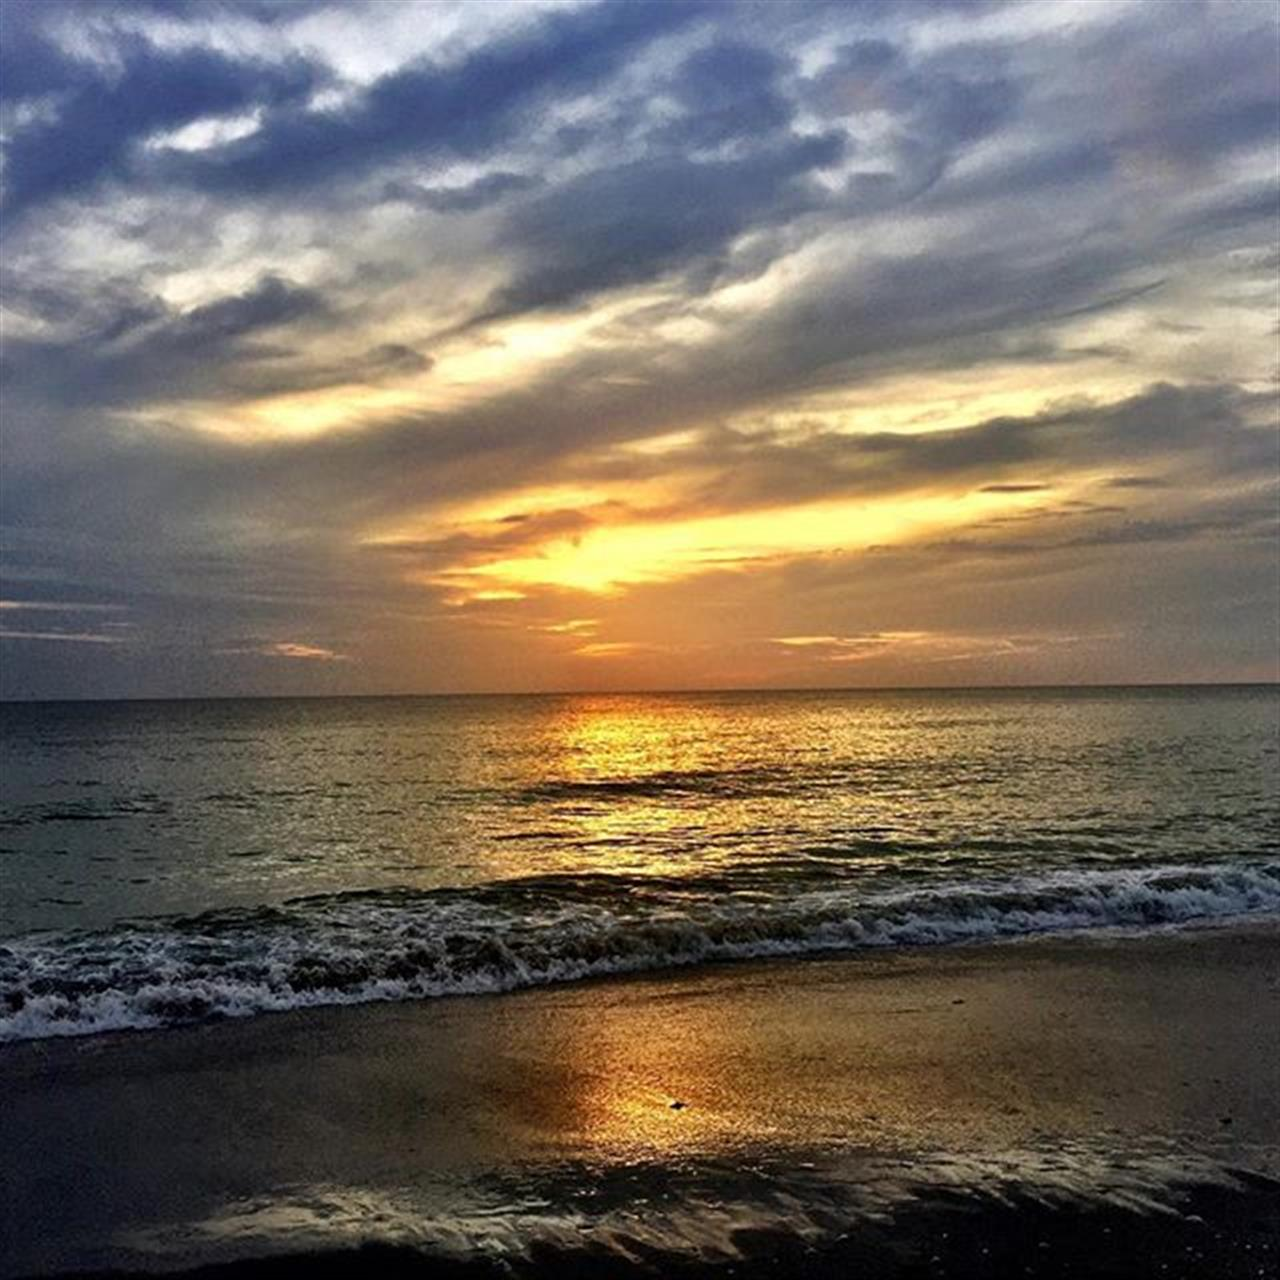 Another gorgeous one! . . . #LGI #littlegasparillaisland #gasparilla #florida #leadingrelocal #milliondollarlisting #sunset #beach #fl @visitflorida